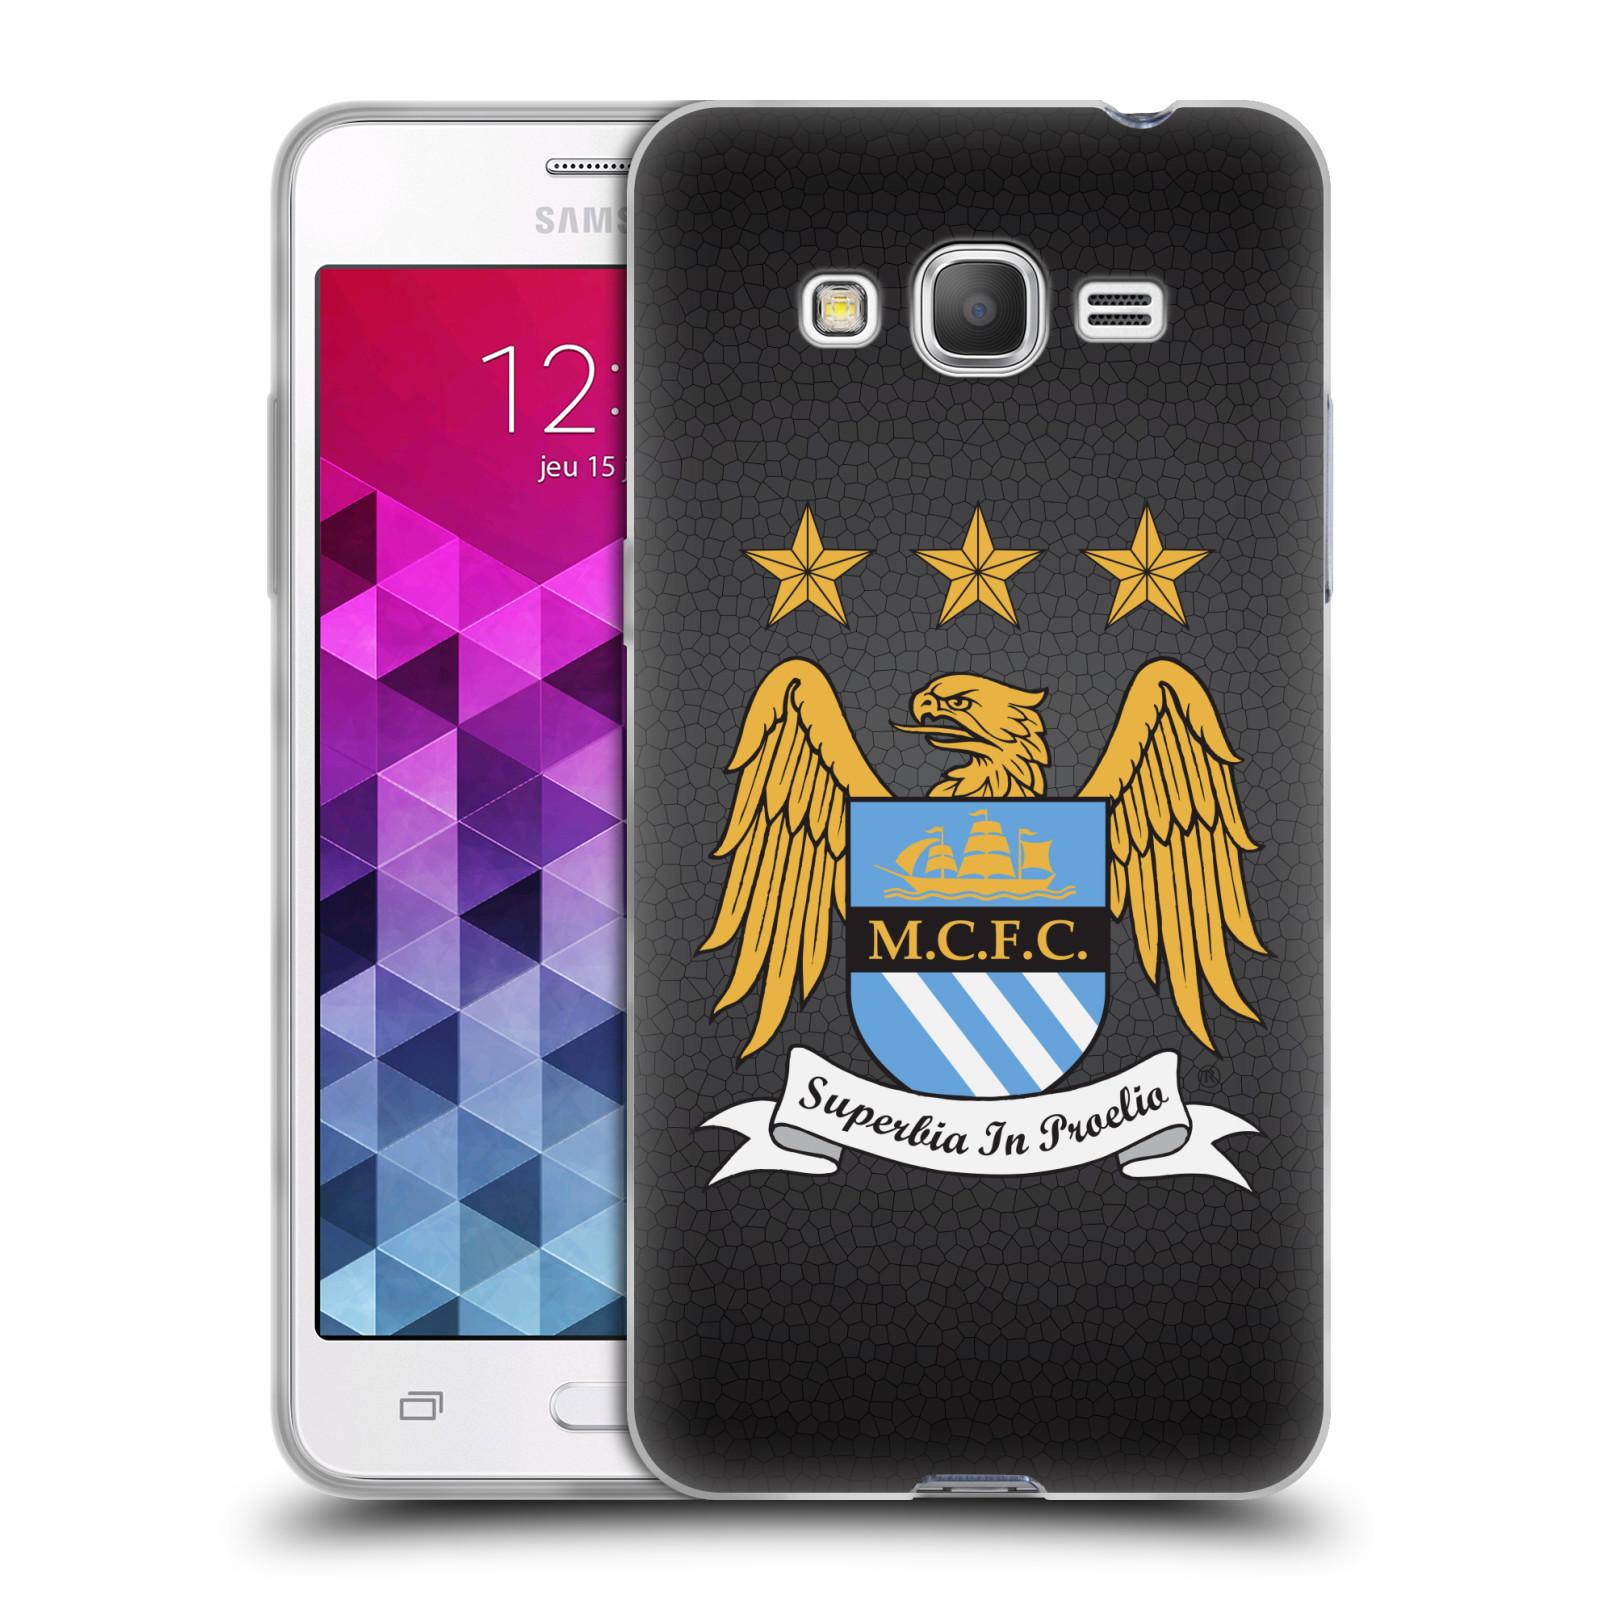 Silikonové pouzdro na mobil Samsung Galaxy Grand Prime HEAD CASE Manchester City FC - Superbia In Proelio